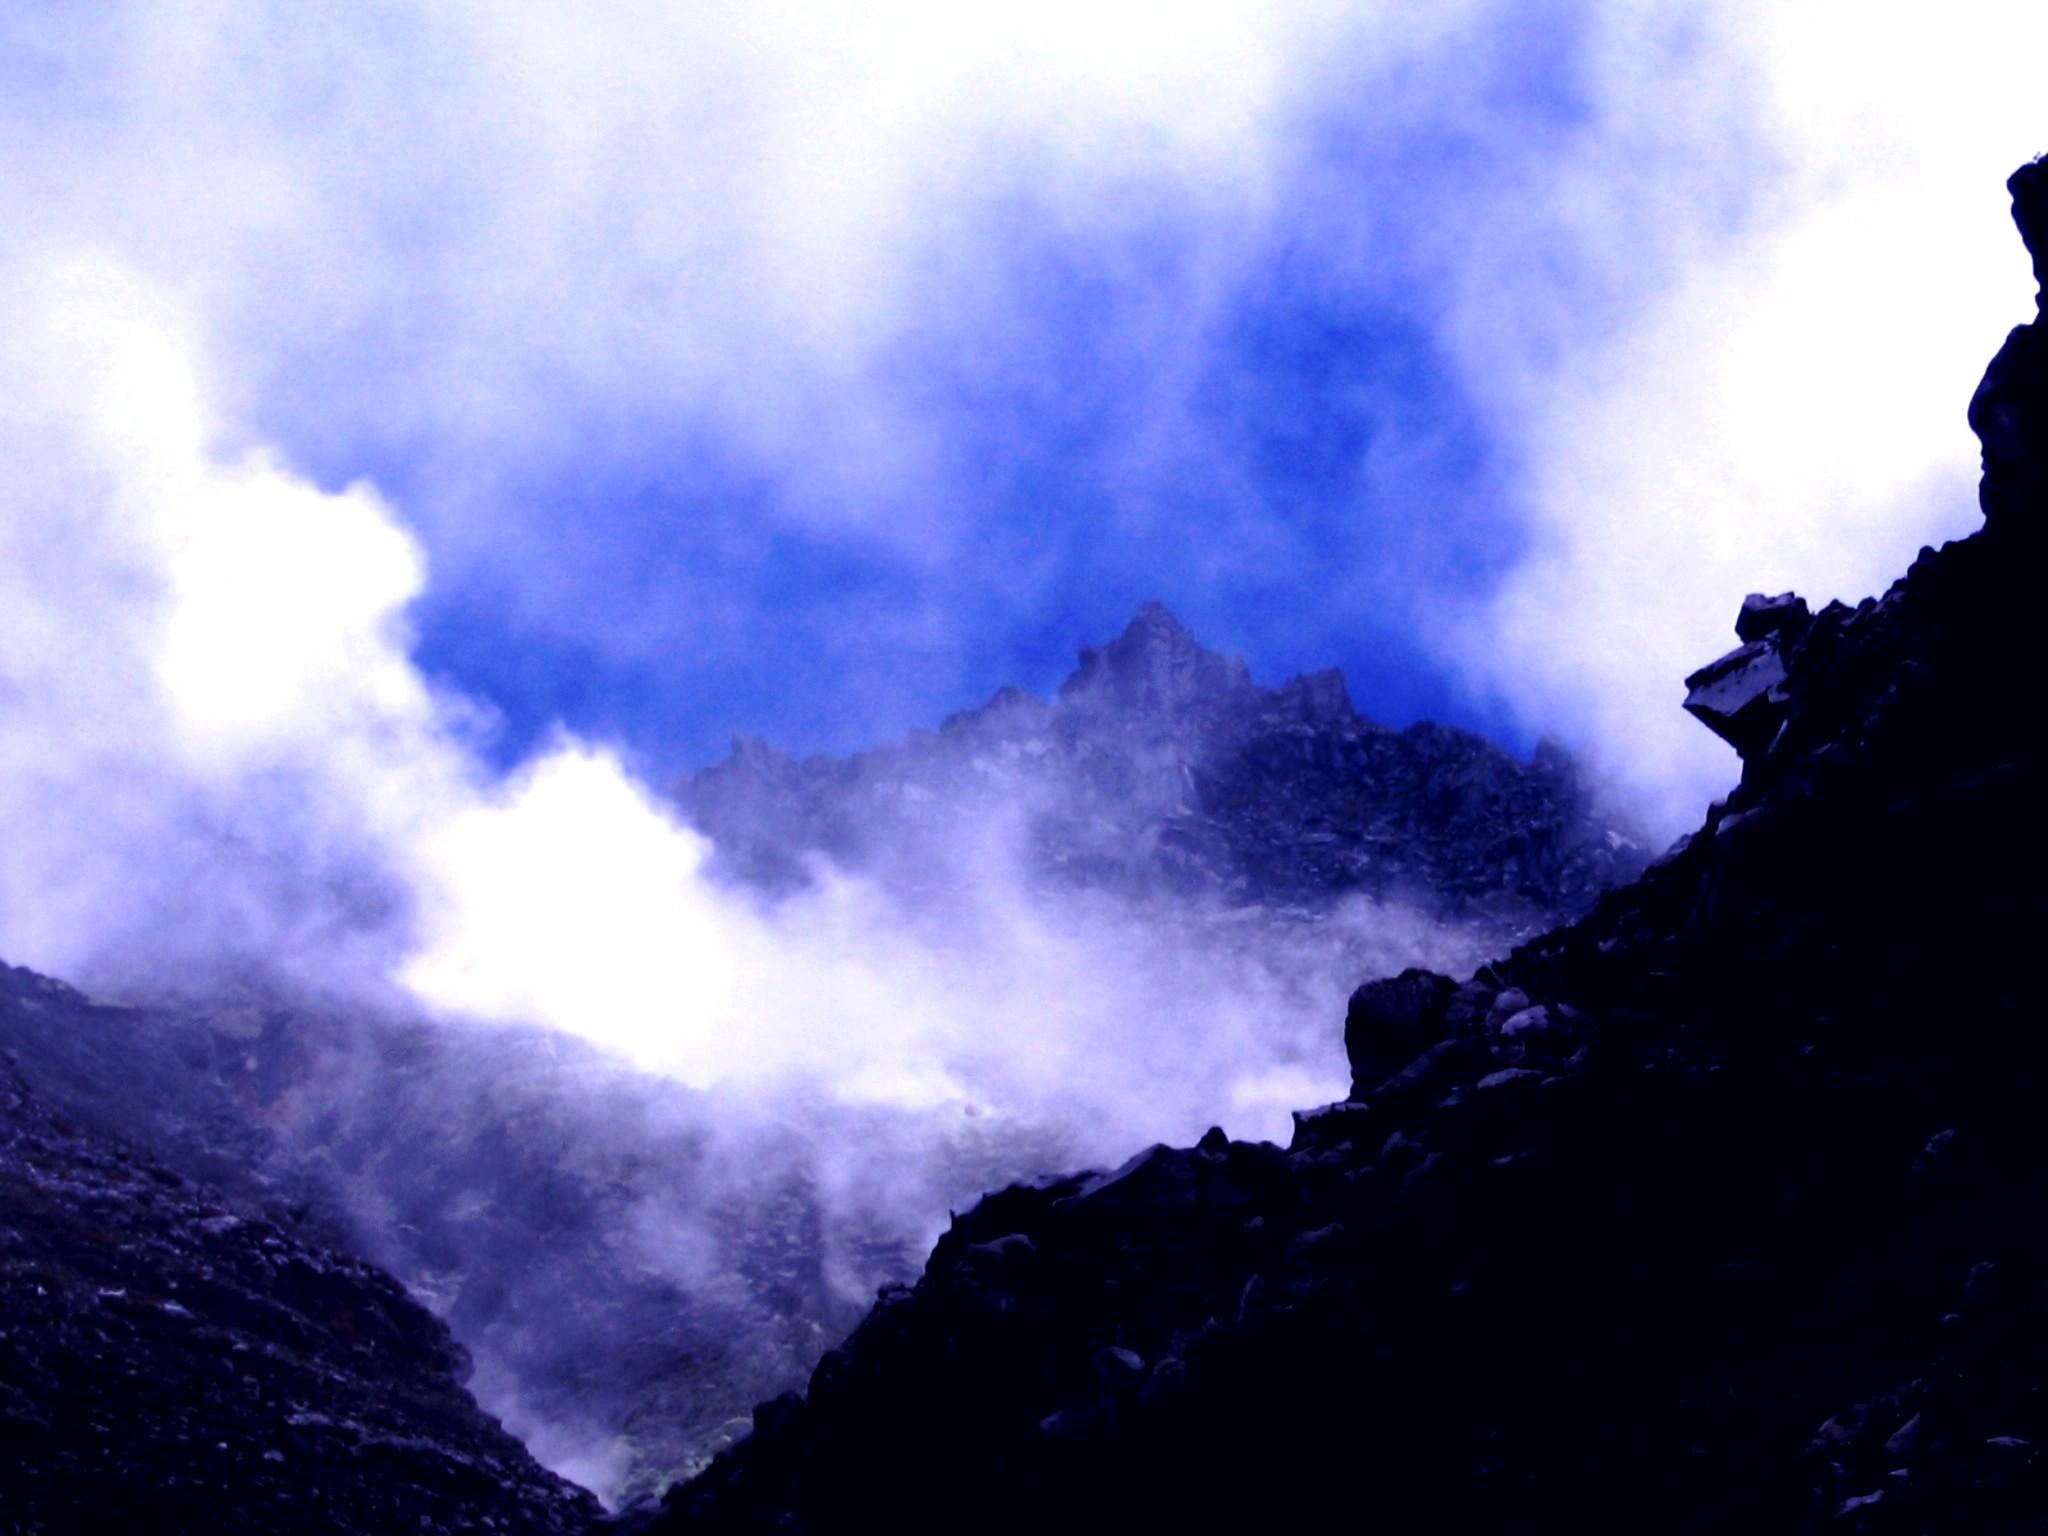 Volcanic smoke, Bspo06, Danger, Force, Hot, HQ Photo